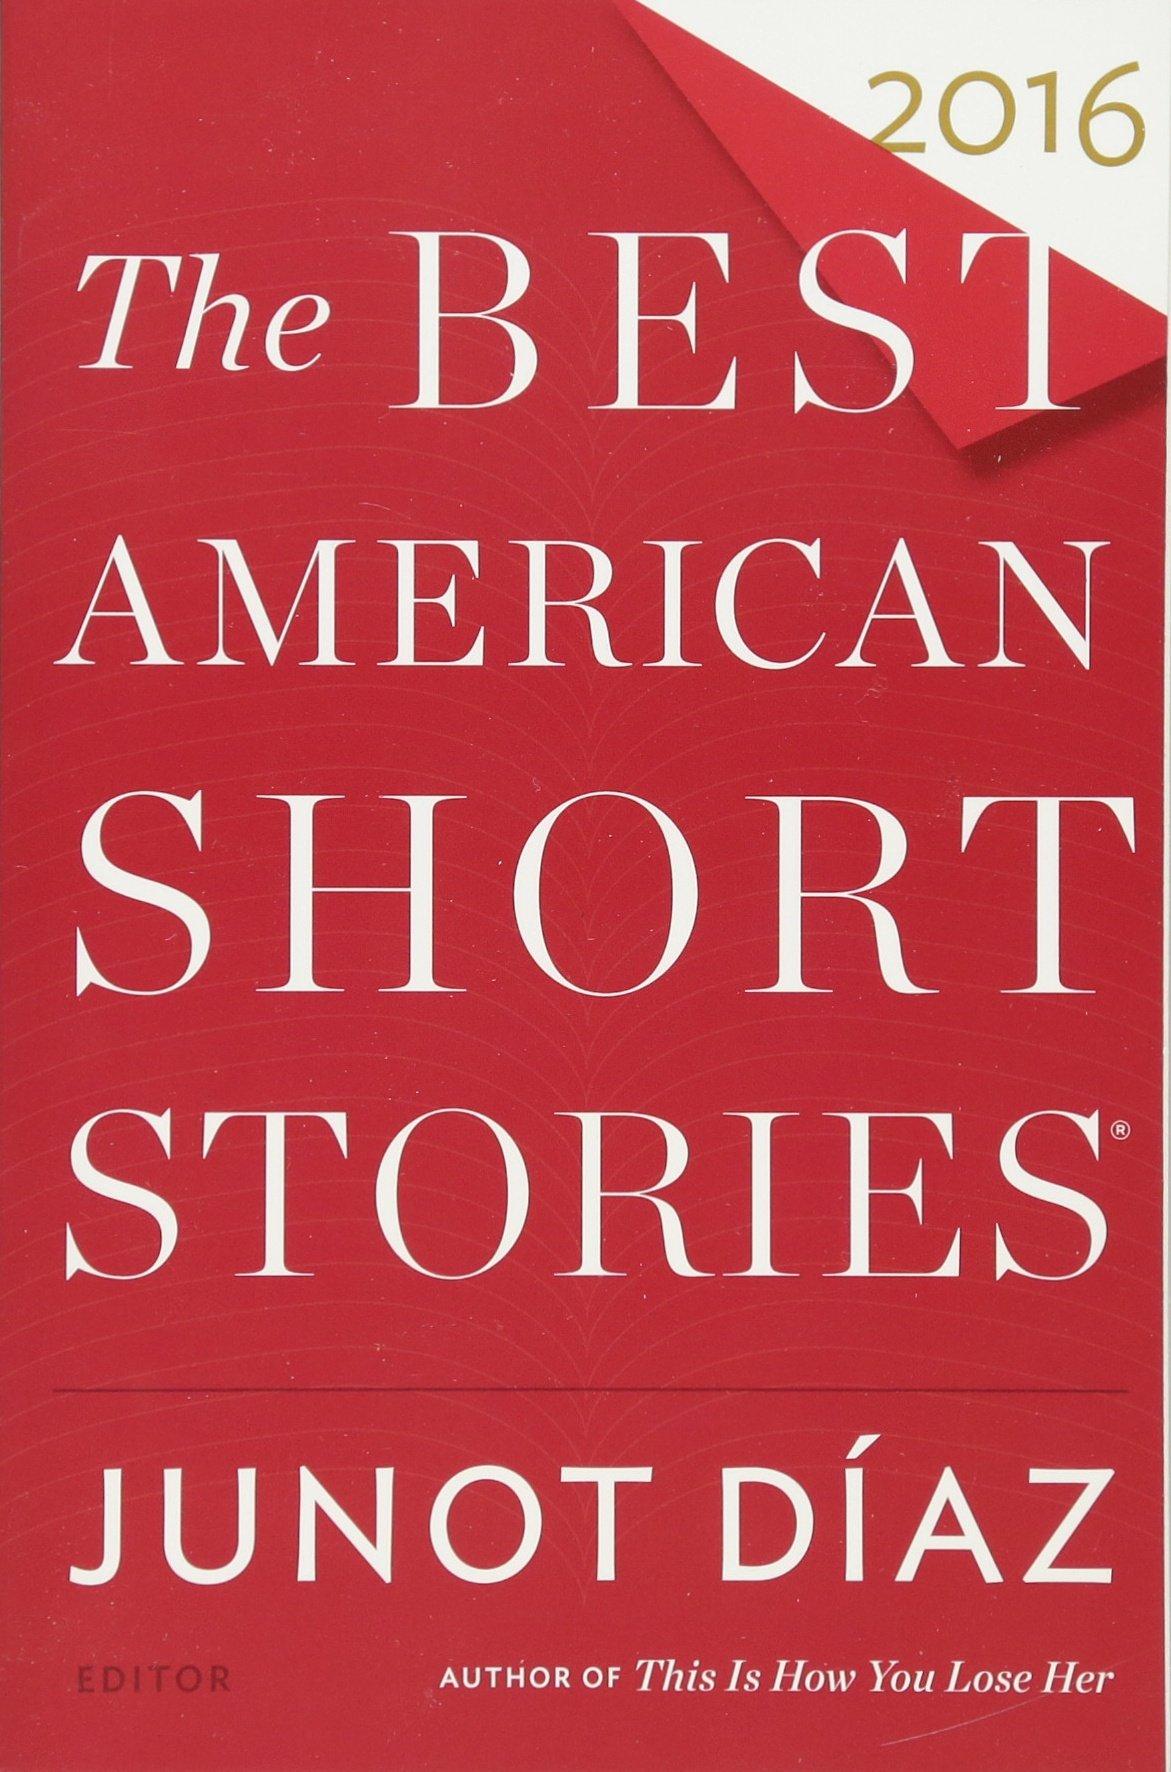 The best american short stories 2016 the best american series junot d az heidi pitlor 9780544582897 amazon com books